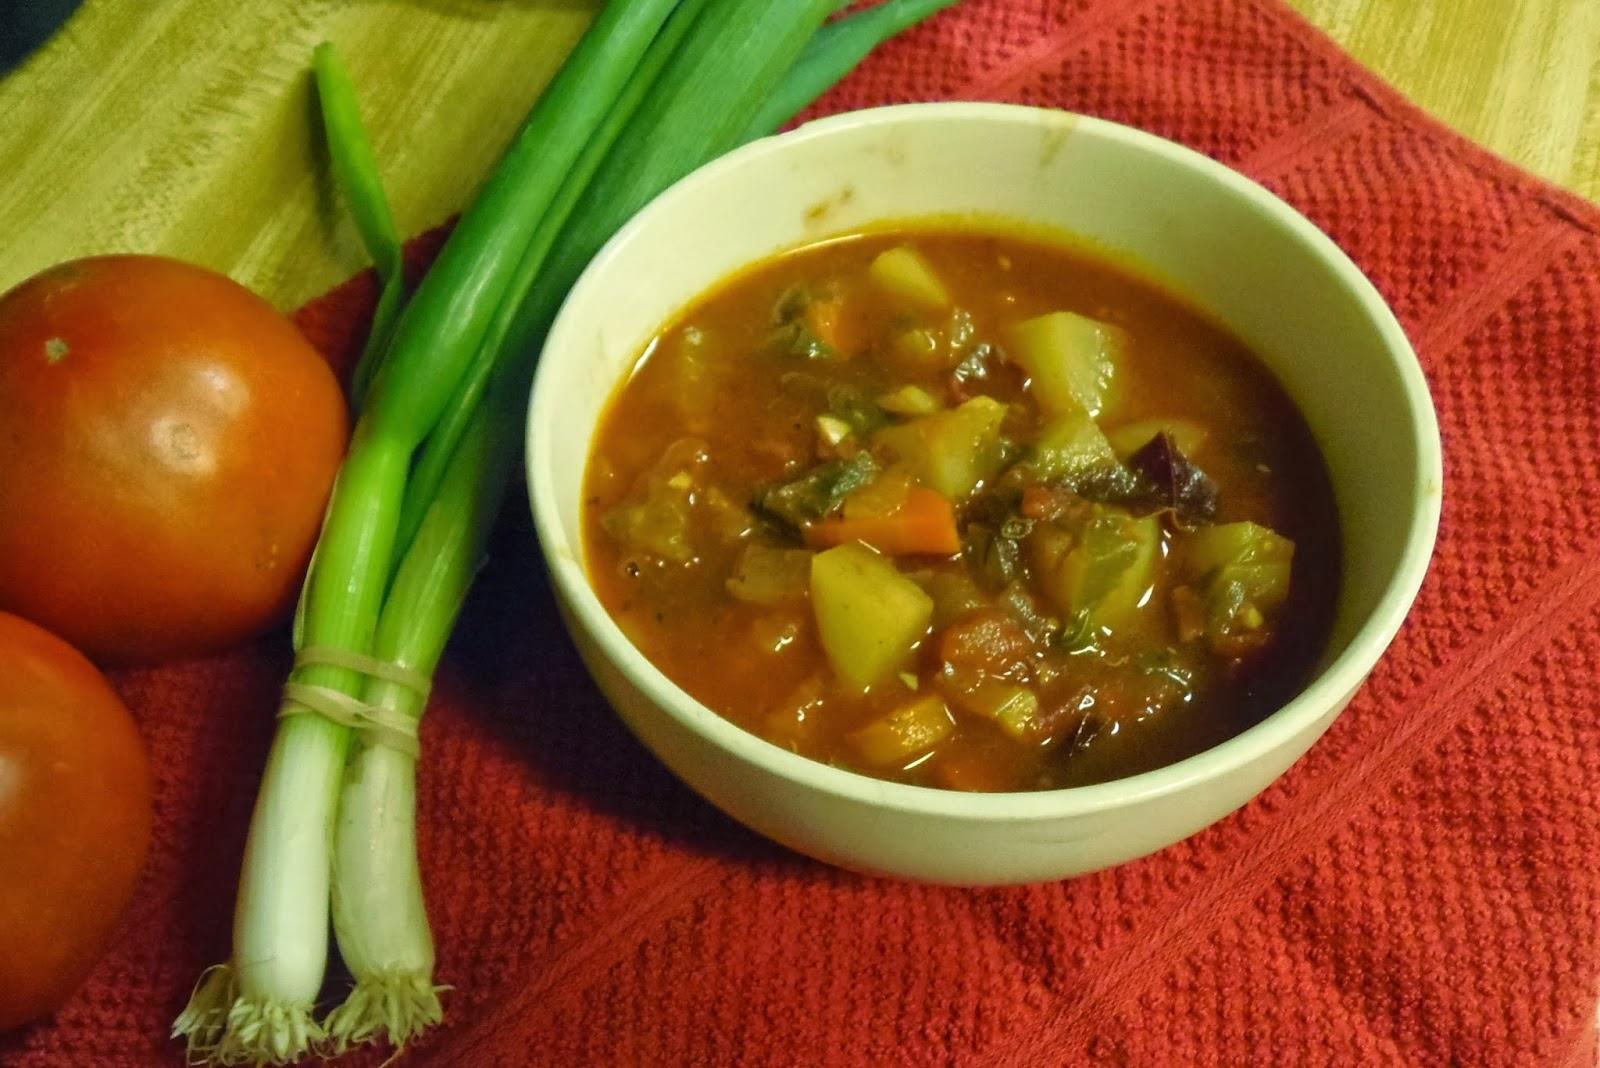 Italian vegetable hoagies recipes - italian vegetable hoagies recipe